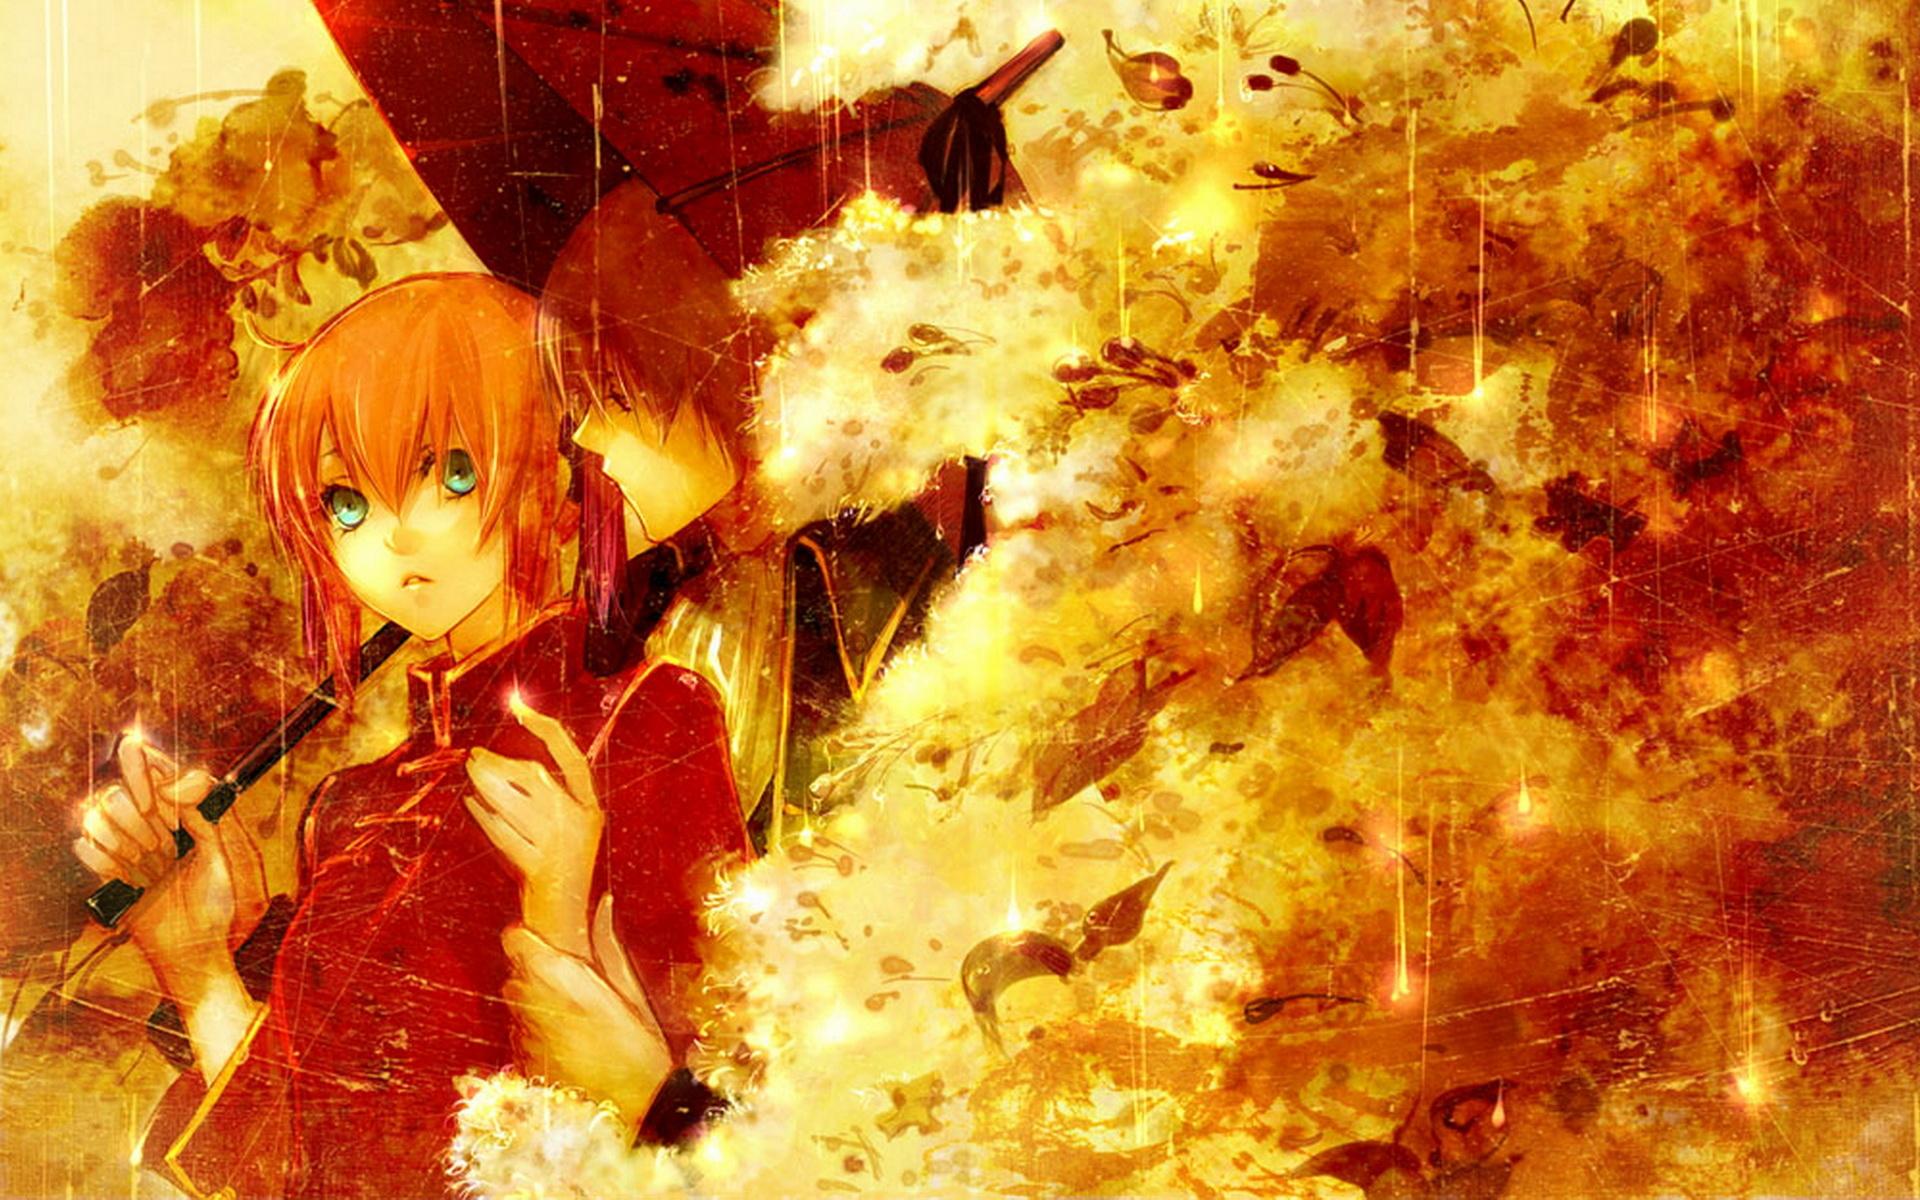 Anime Fall Wallpapers - WallpaperSafari